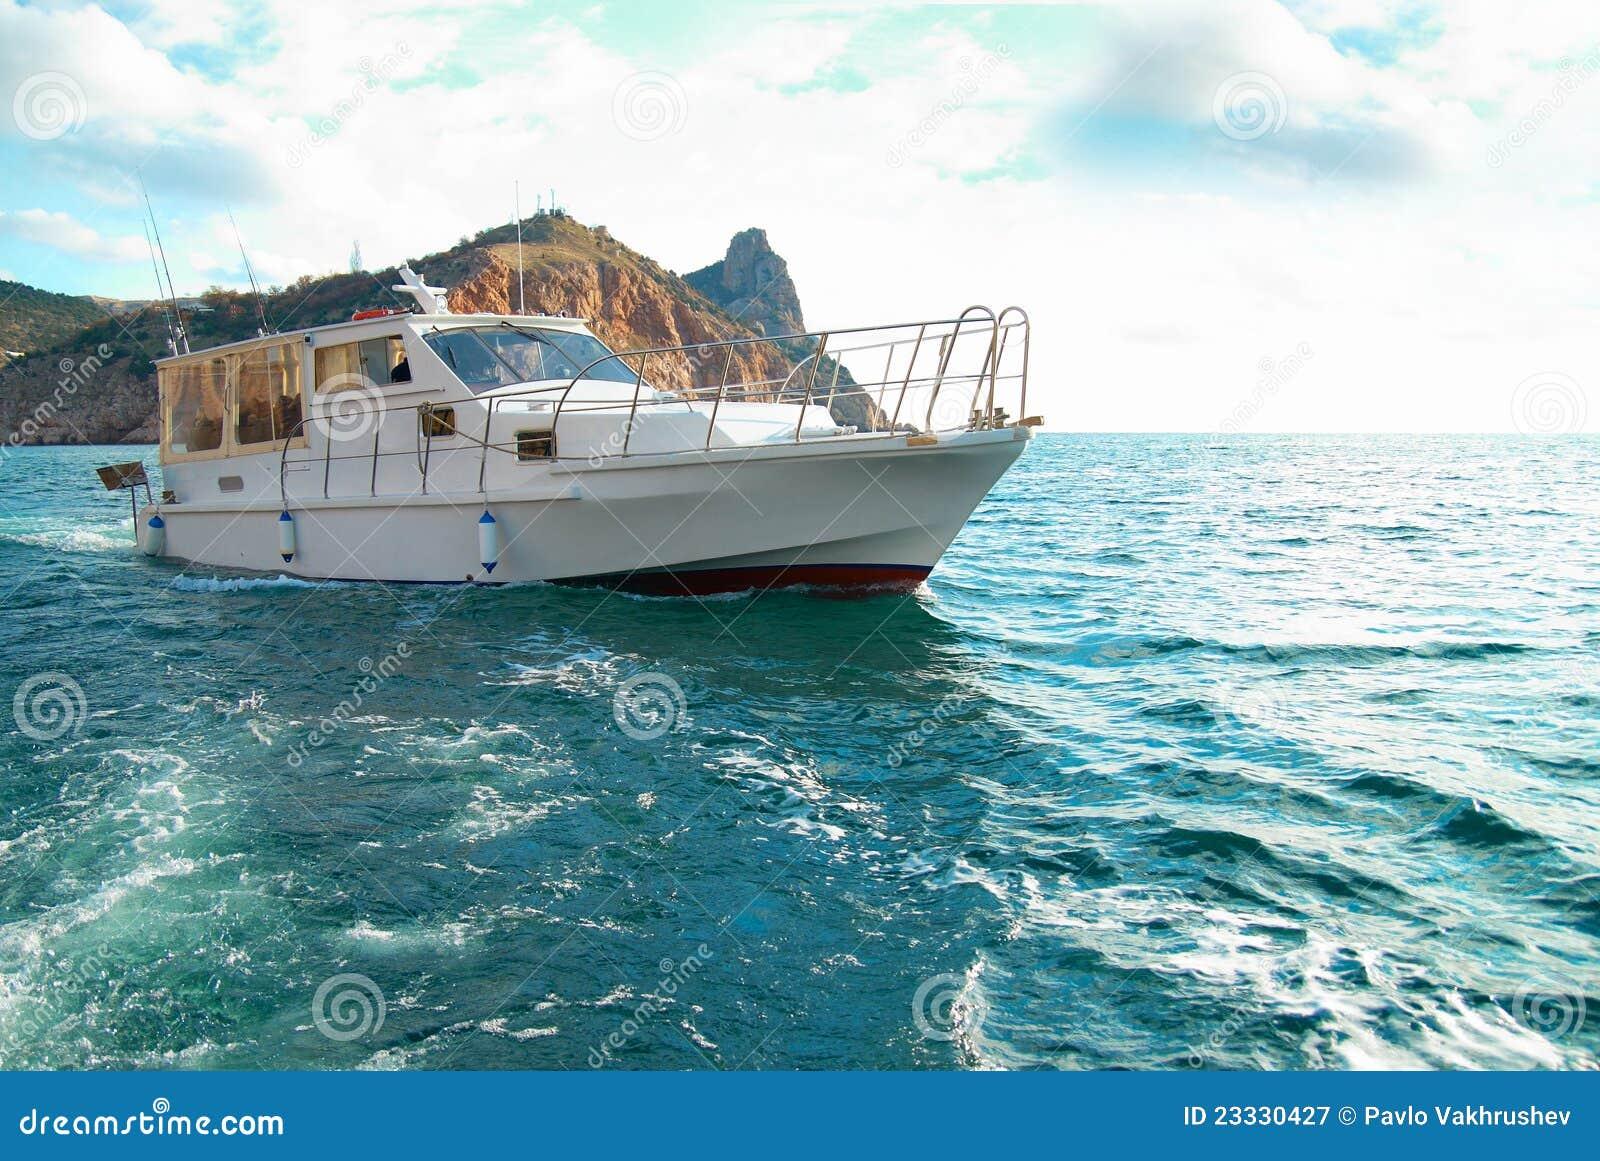 Motor Boat Cruising The Sea Royalty Free Stock Photography